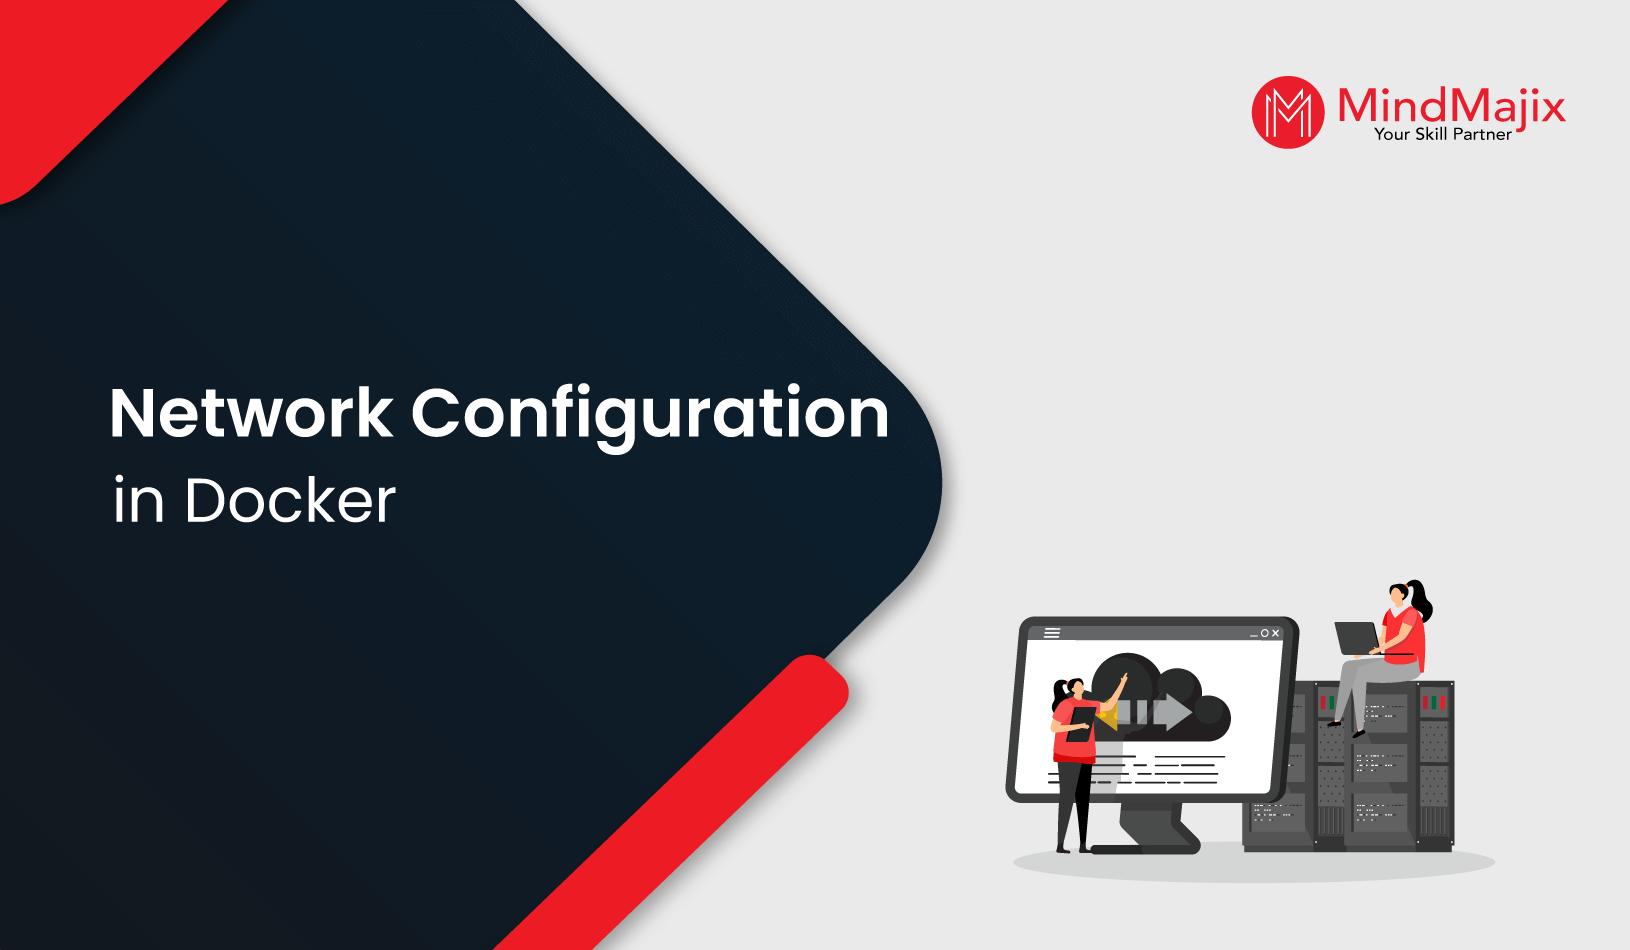 Network Configuration in Docker